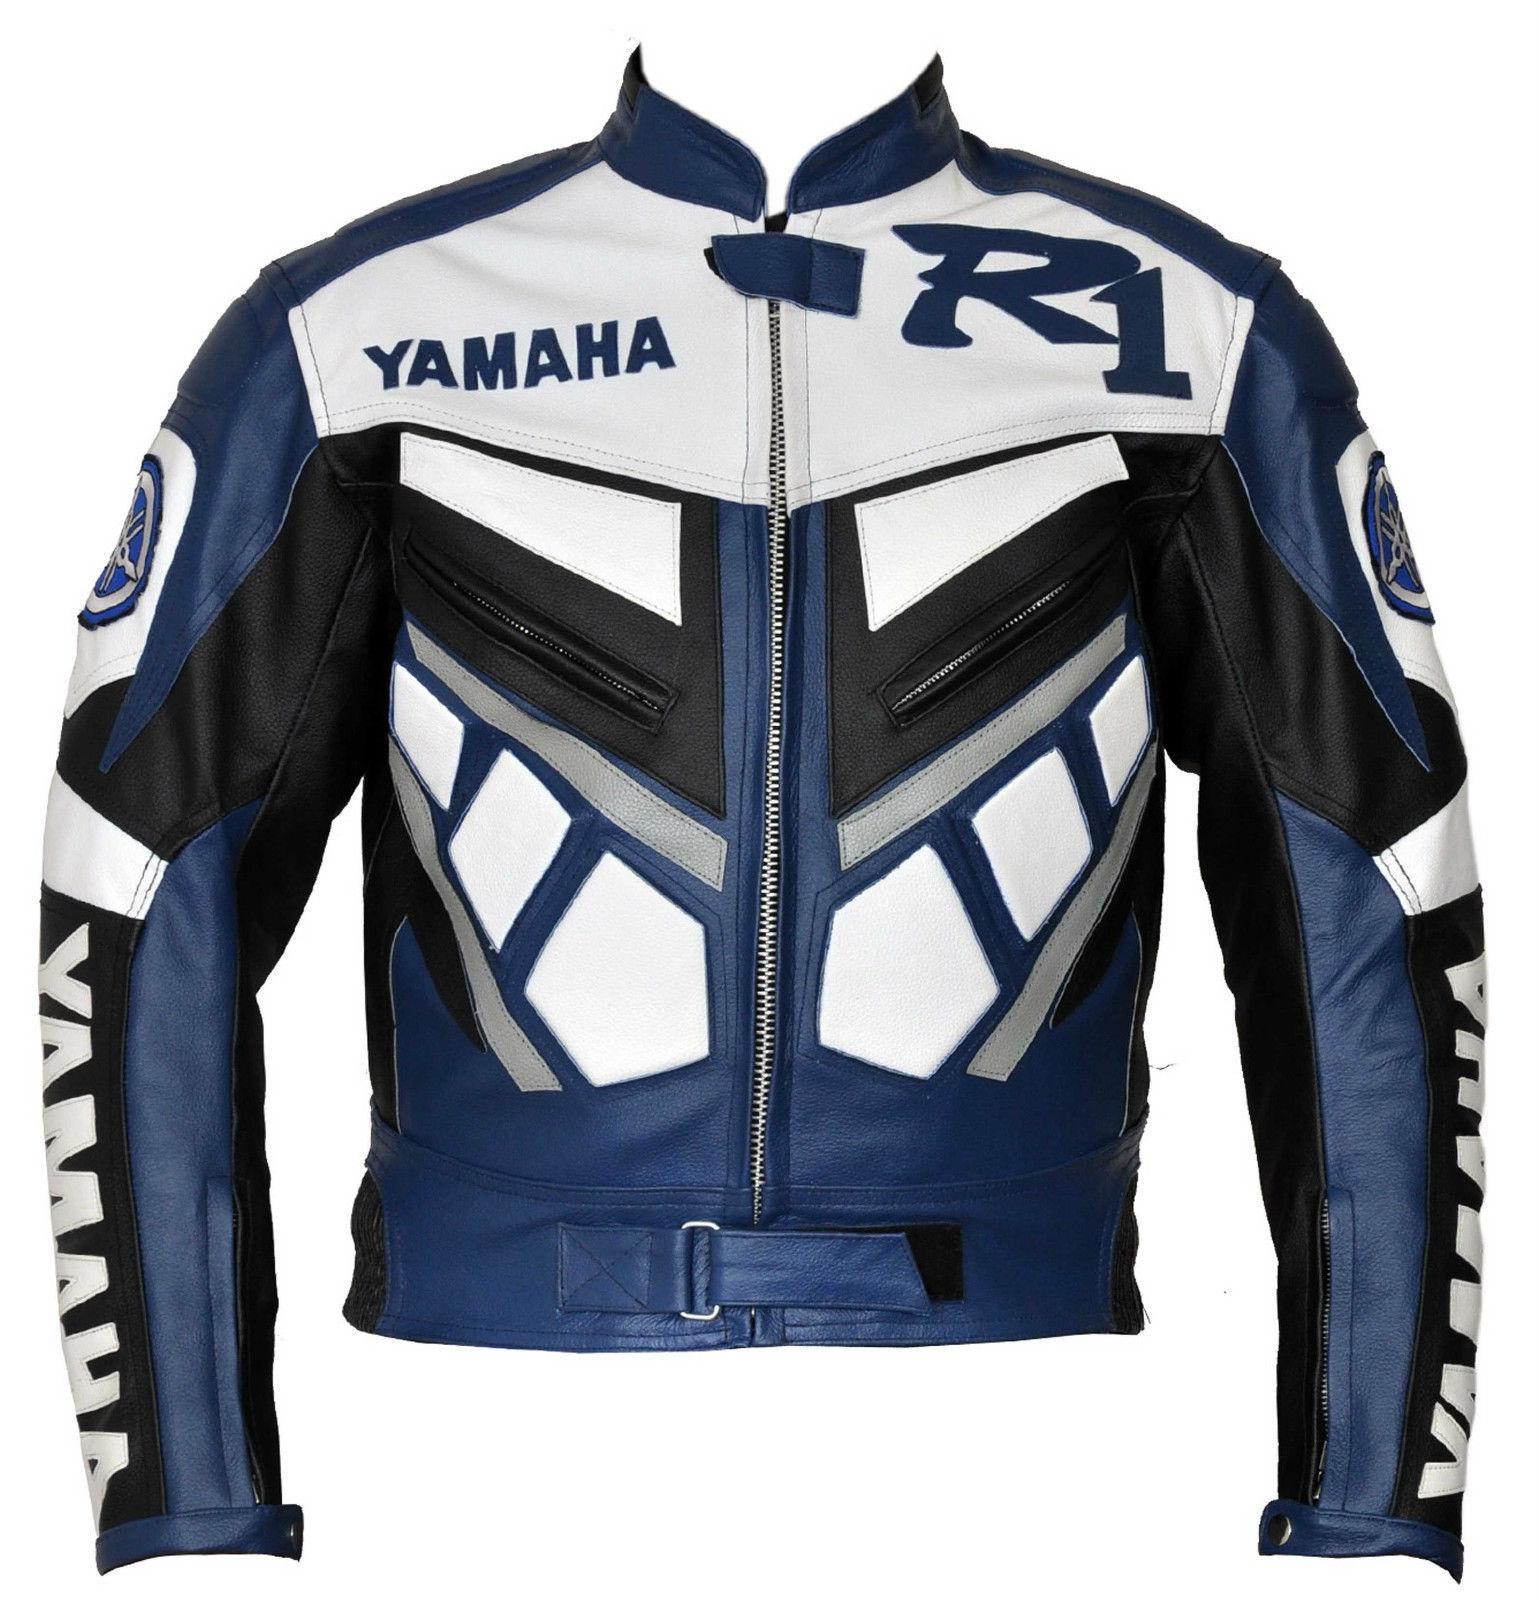 r1 yamaha blue white motorcycle jacket. Black Bedroom Furniture Sets. Home Design Ideas